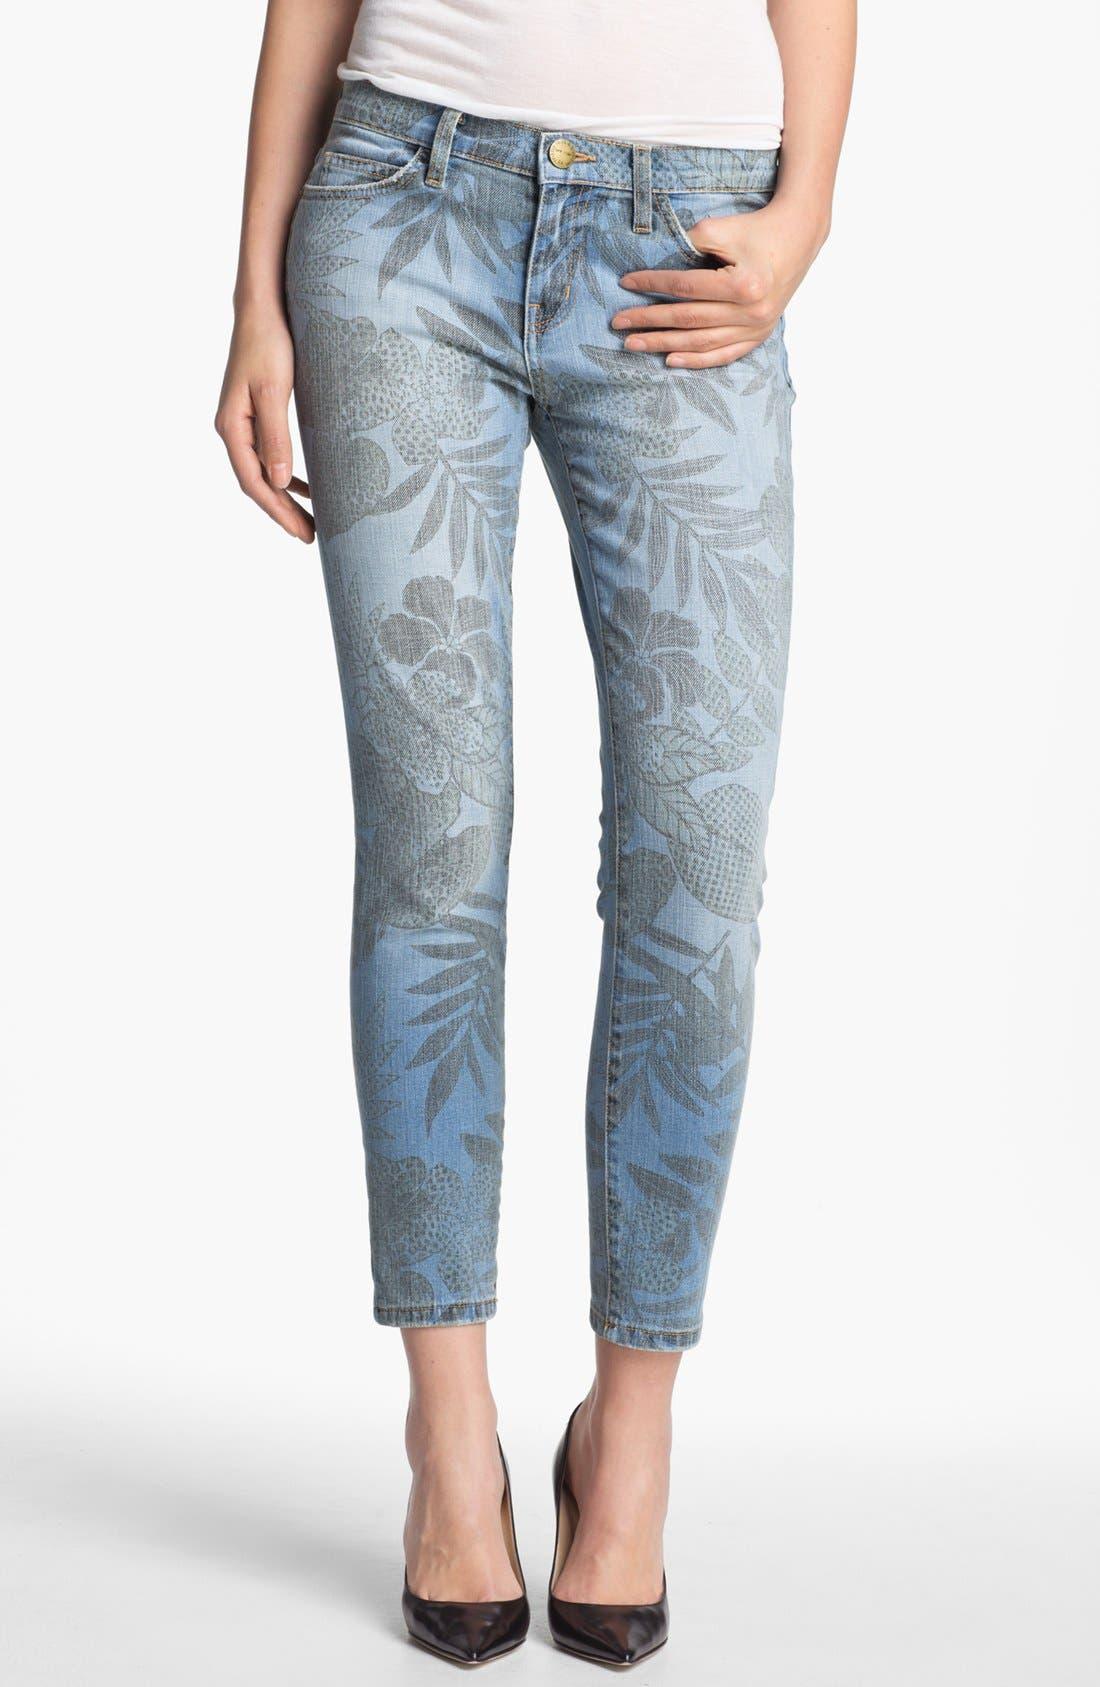 Main Image - Current/Elliott 'The Stiletto' Jungle Print Stretch Jeans